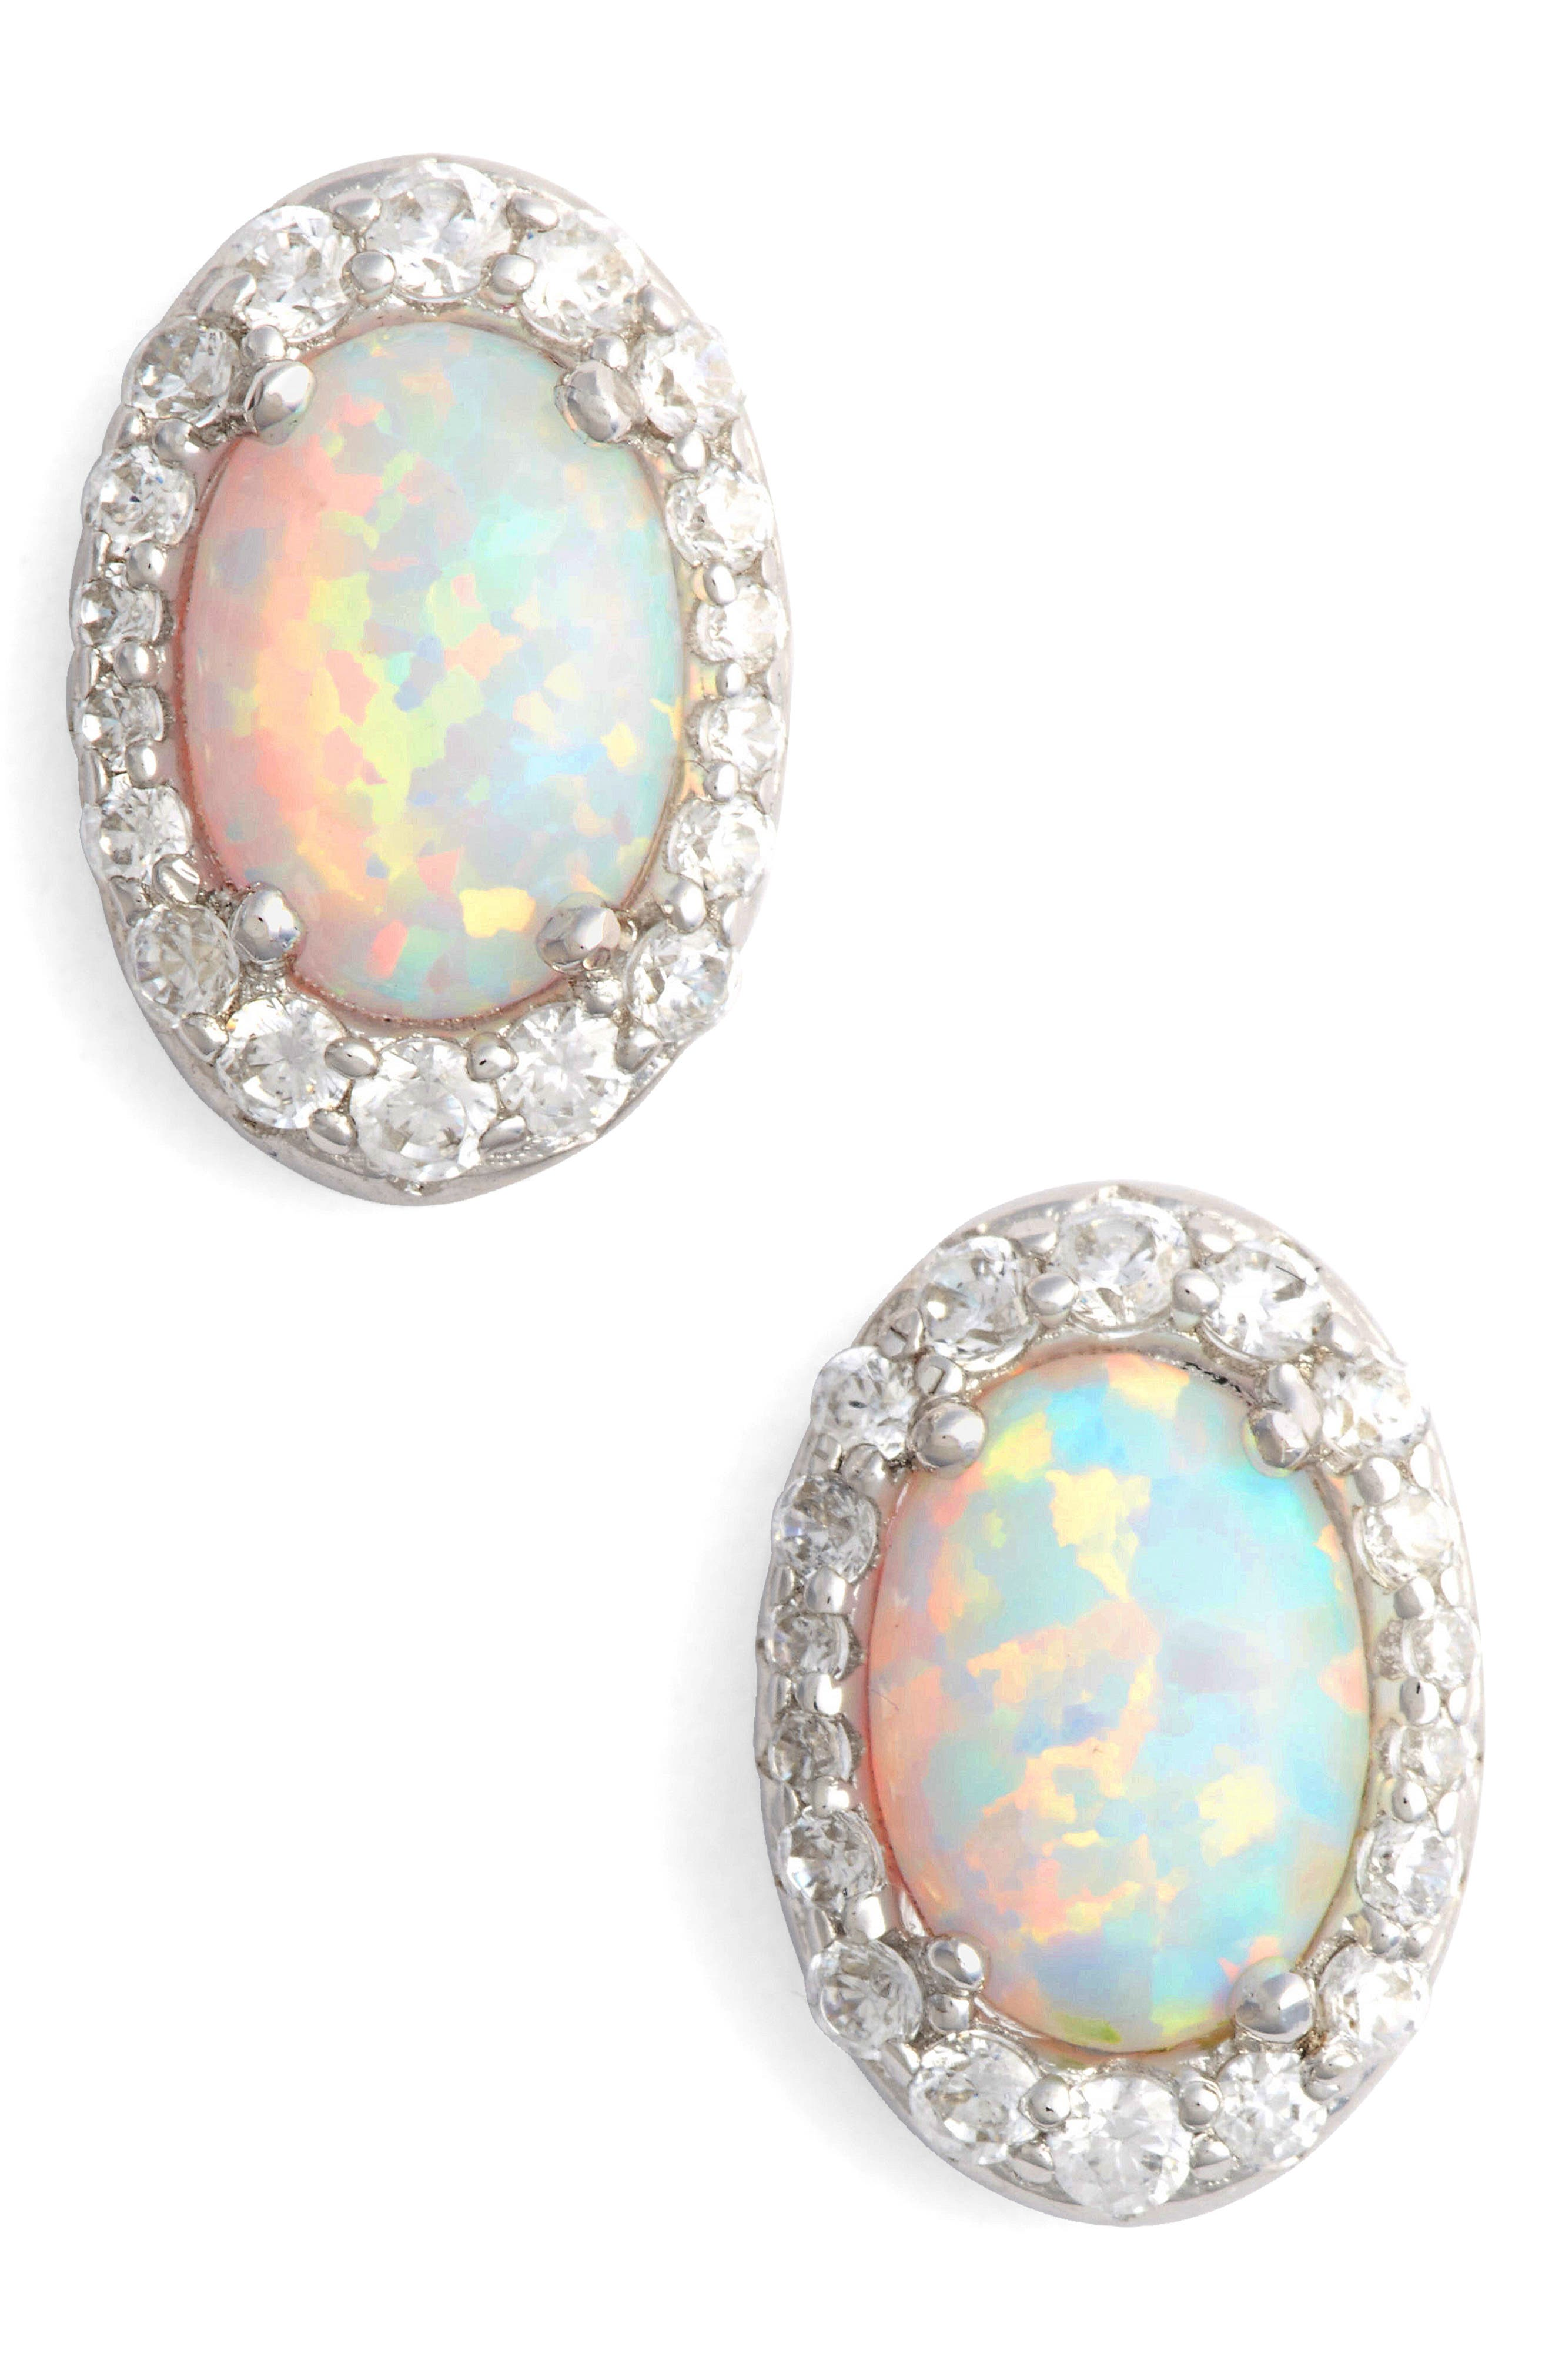 Simulated Opal Halo Stud Earrings,                         Main,                         color, 100